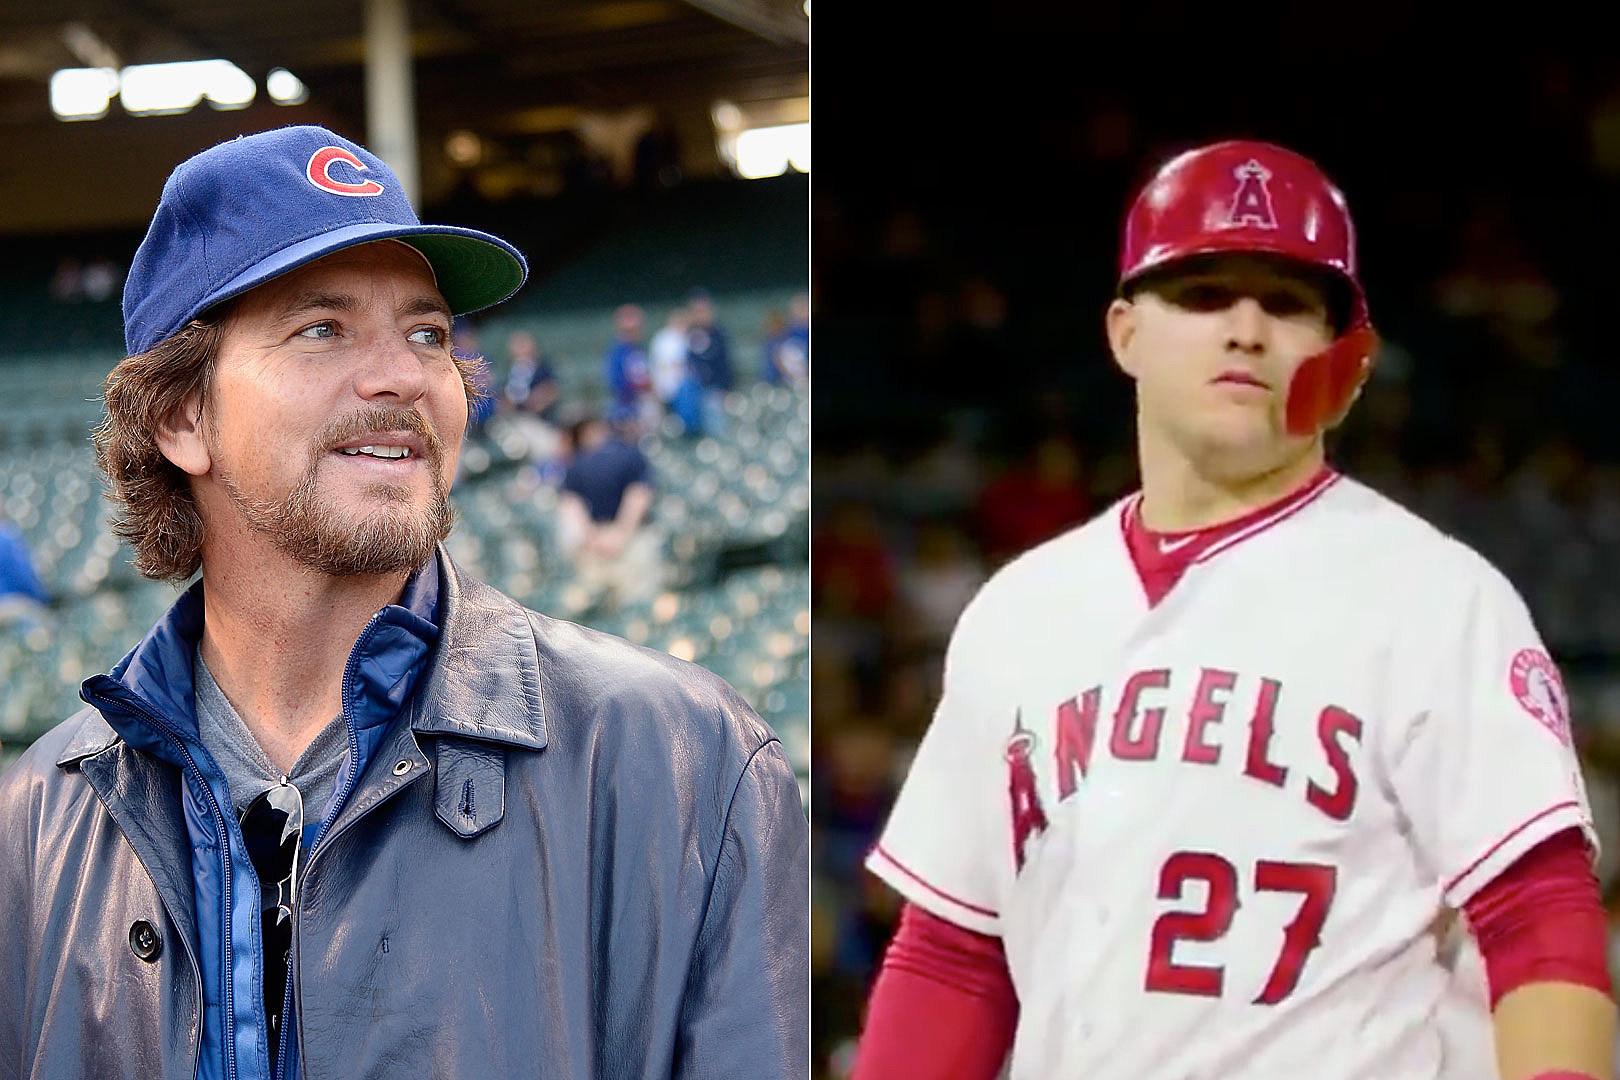 David Banks, Getty Images / MLB Network